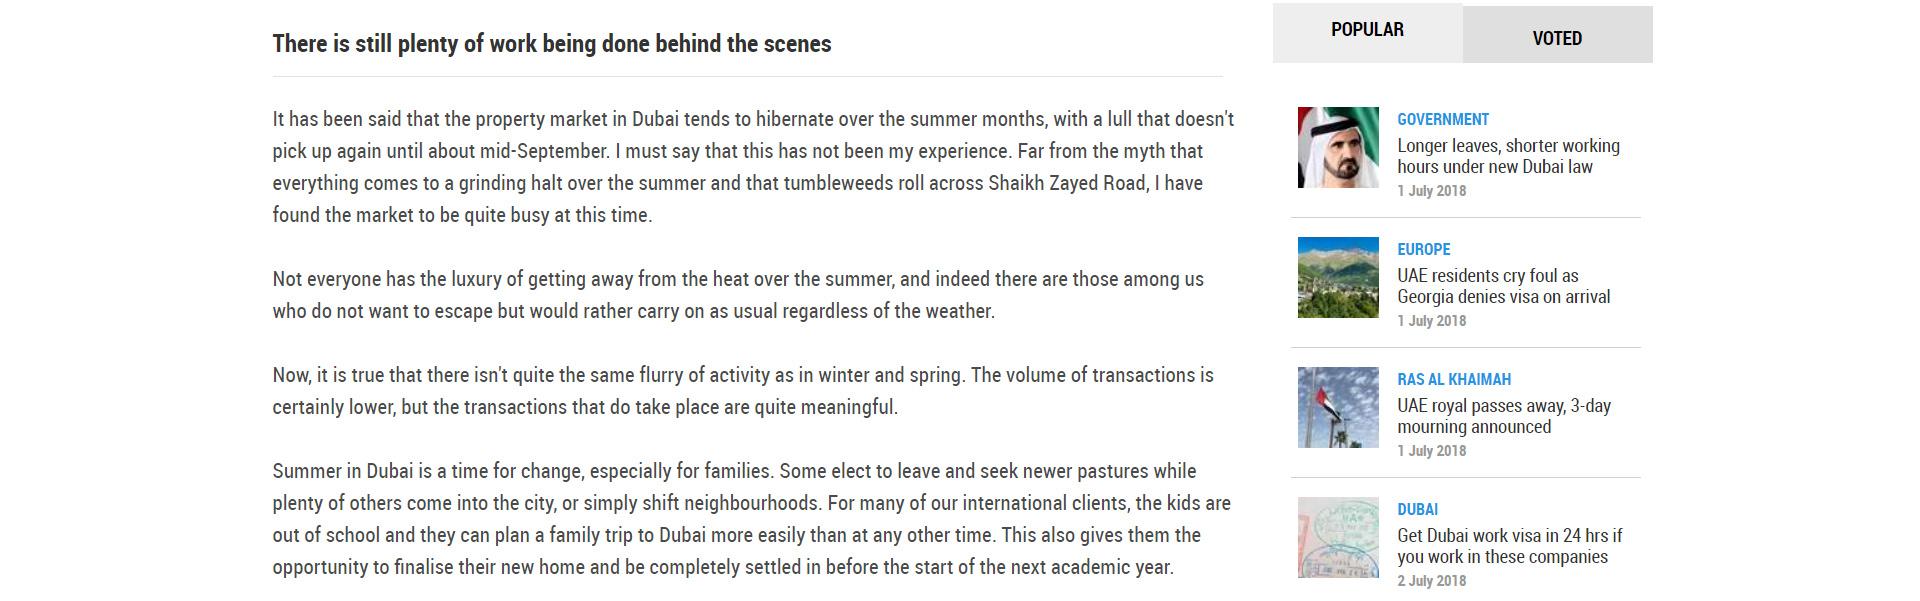 Dubai property market - 3